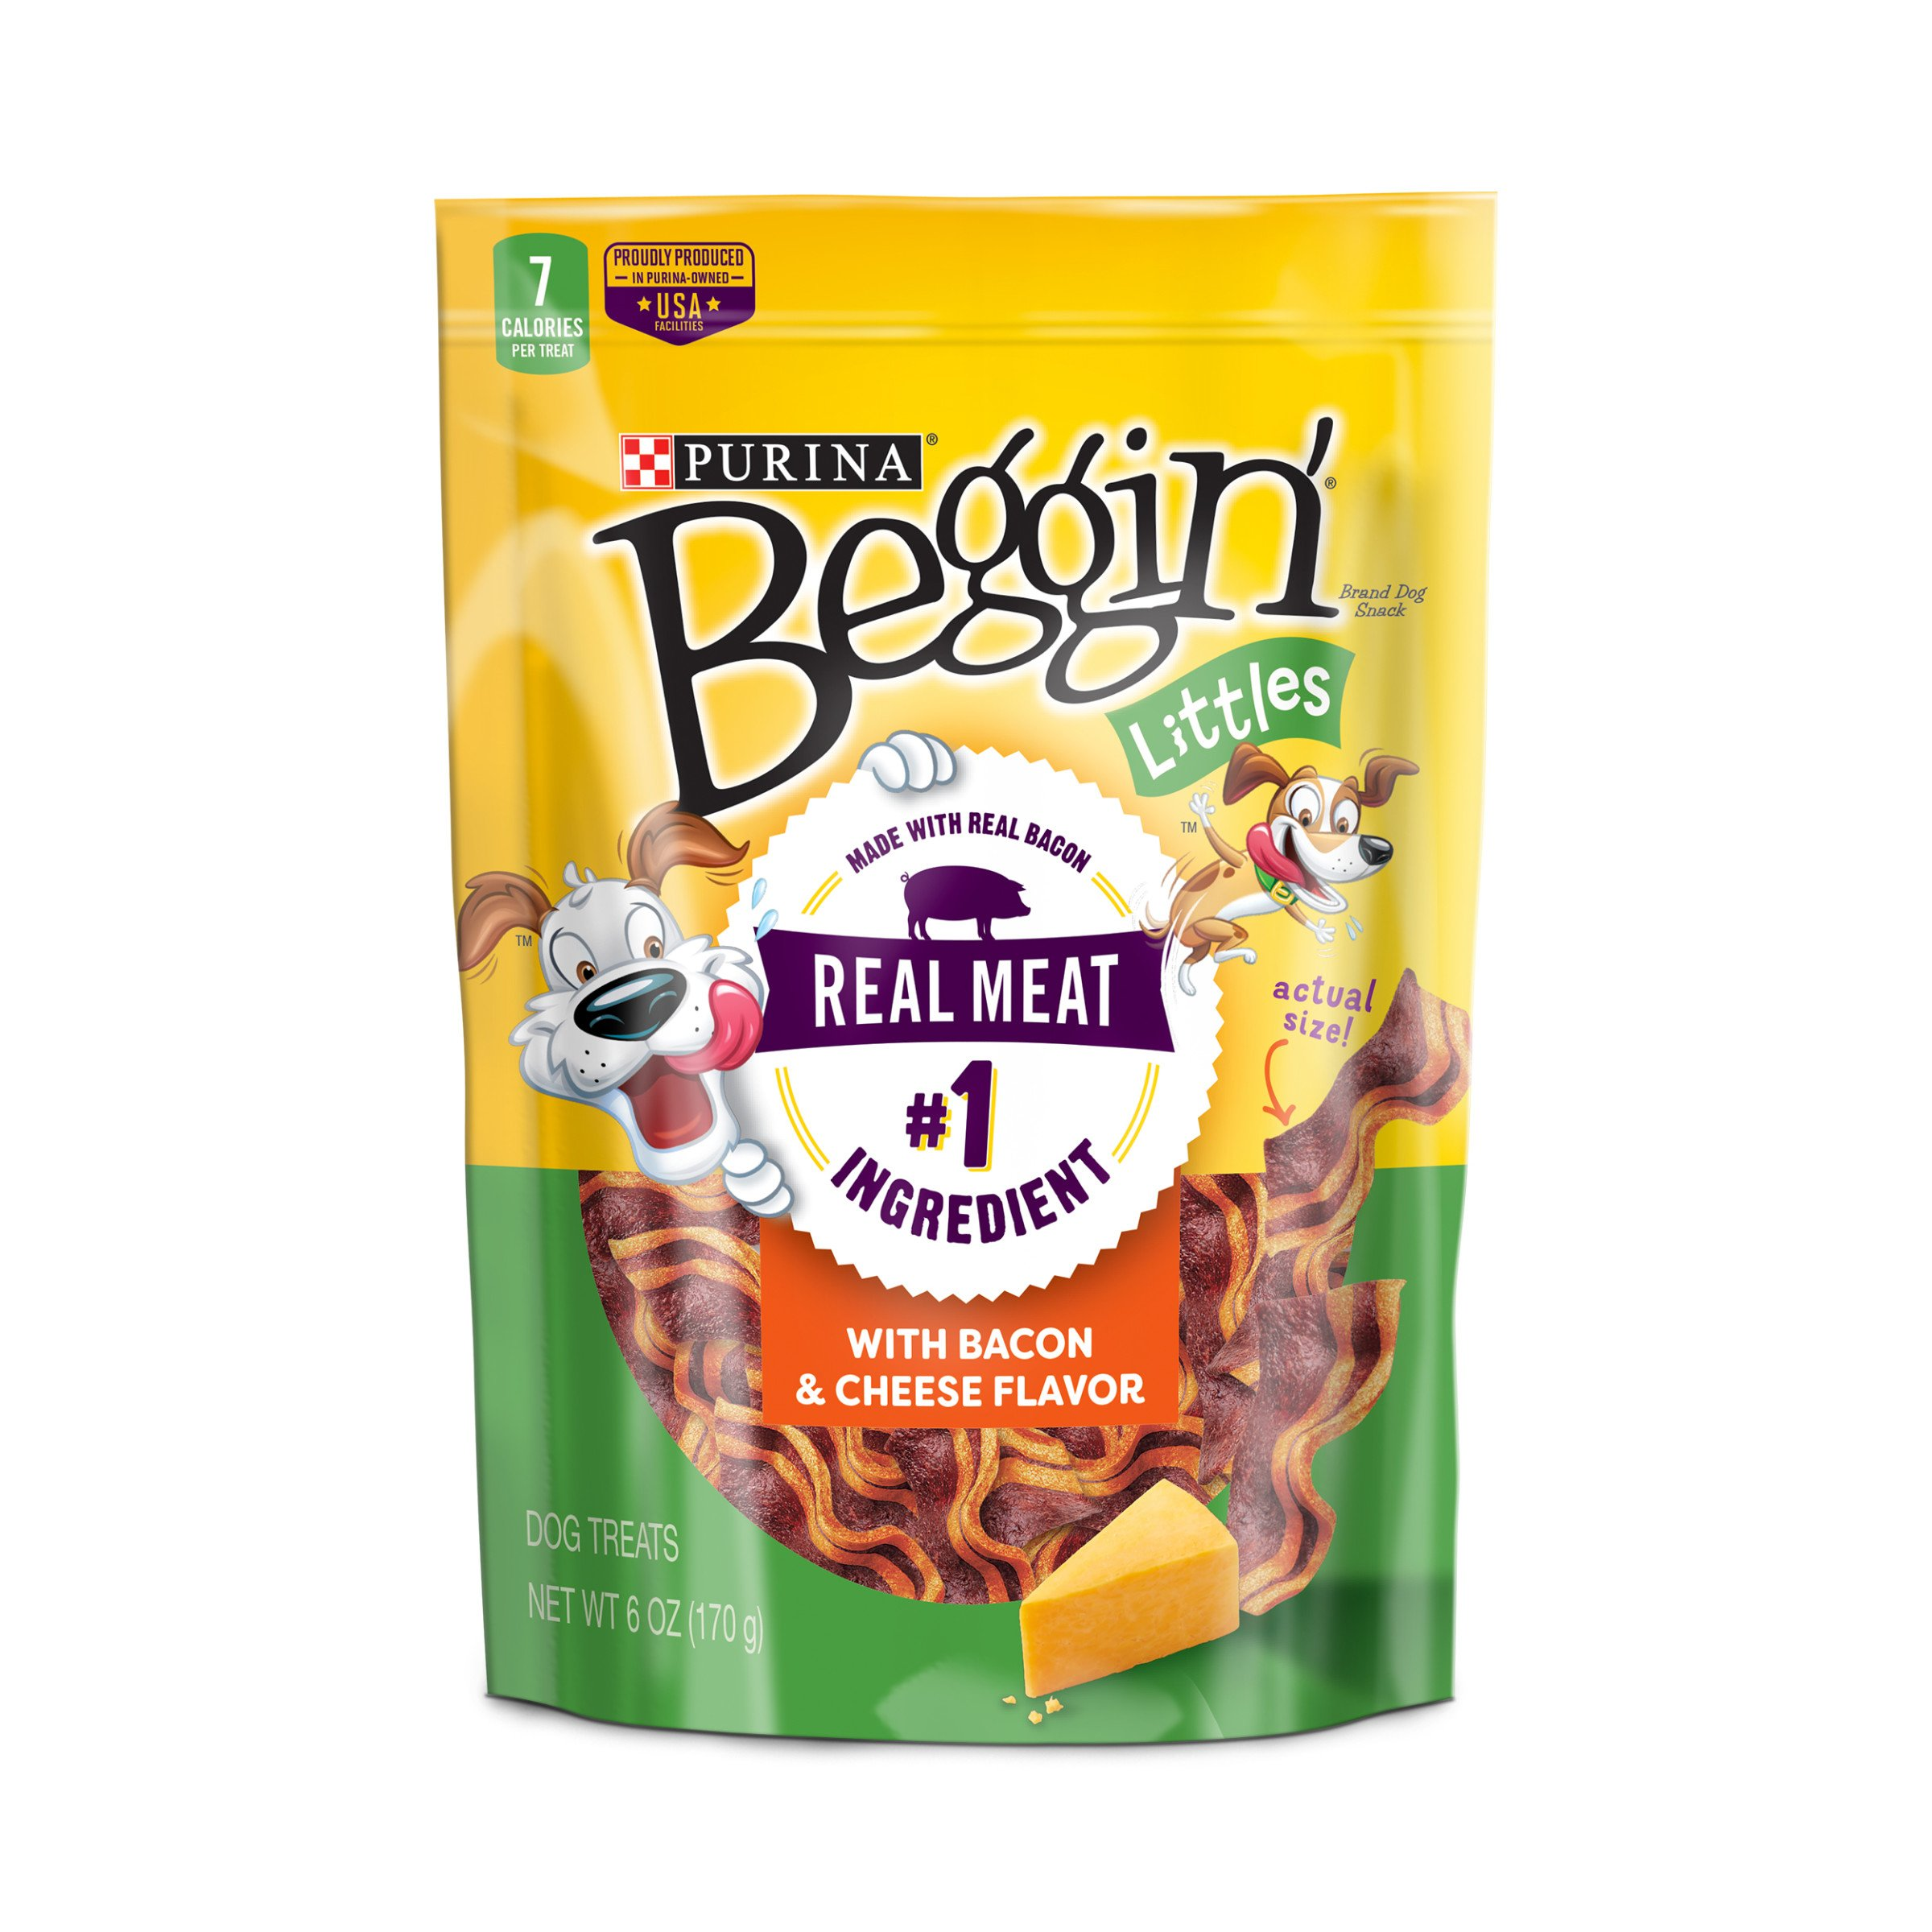 Purina Beggin' Bacon & Cheese Flavors Dog Snacks - (6) 6 oz. Pouch